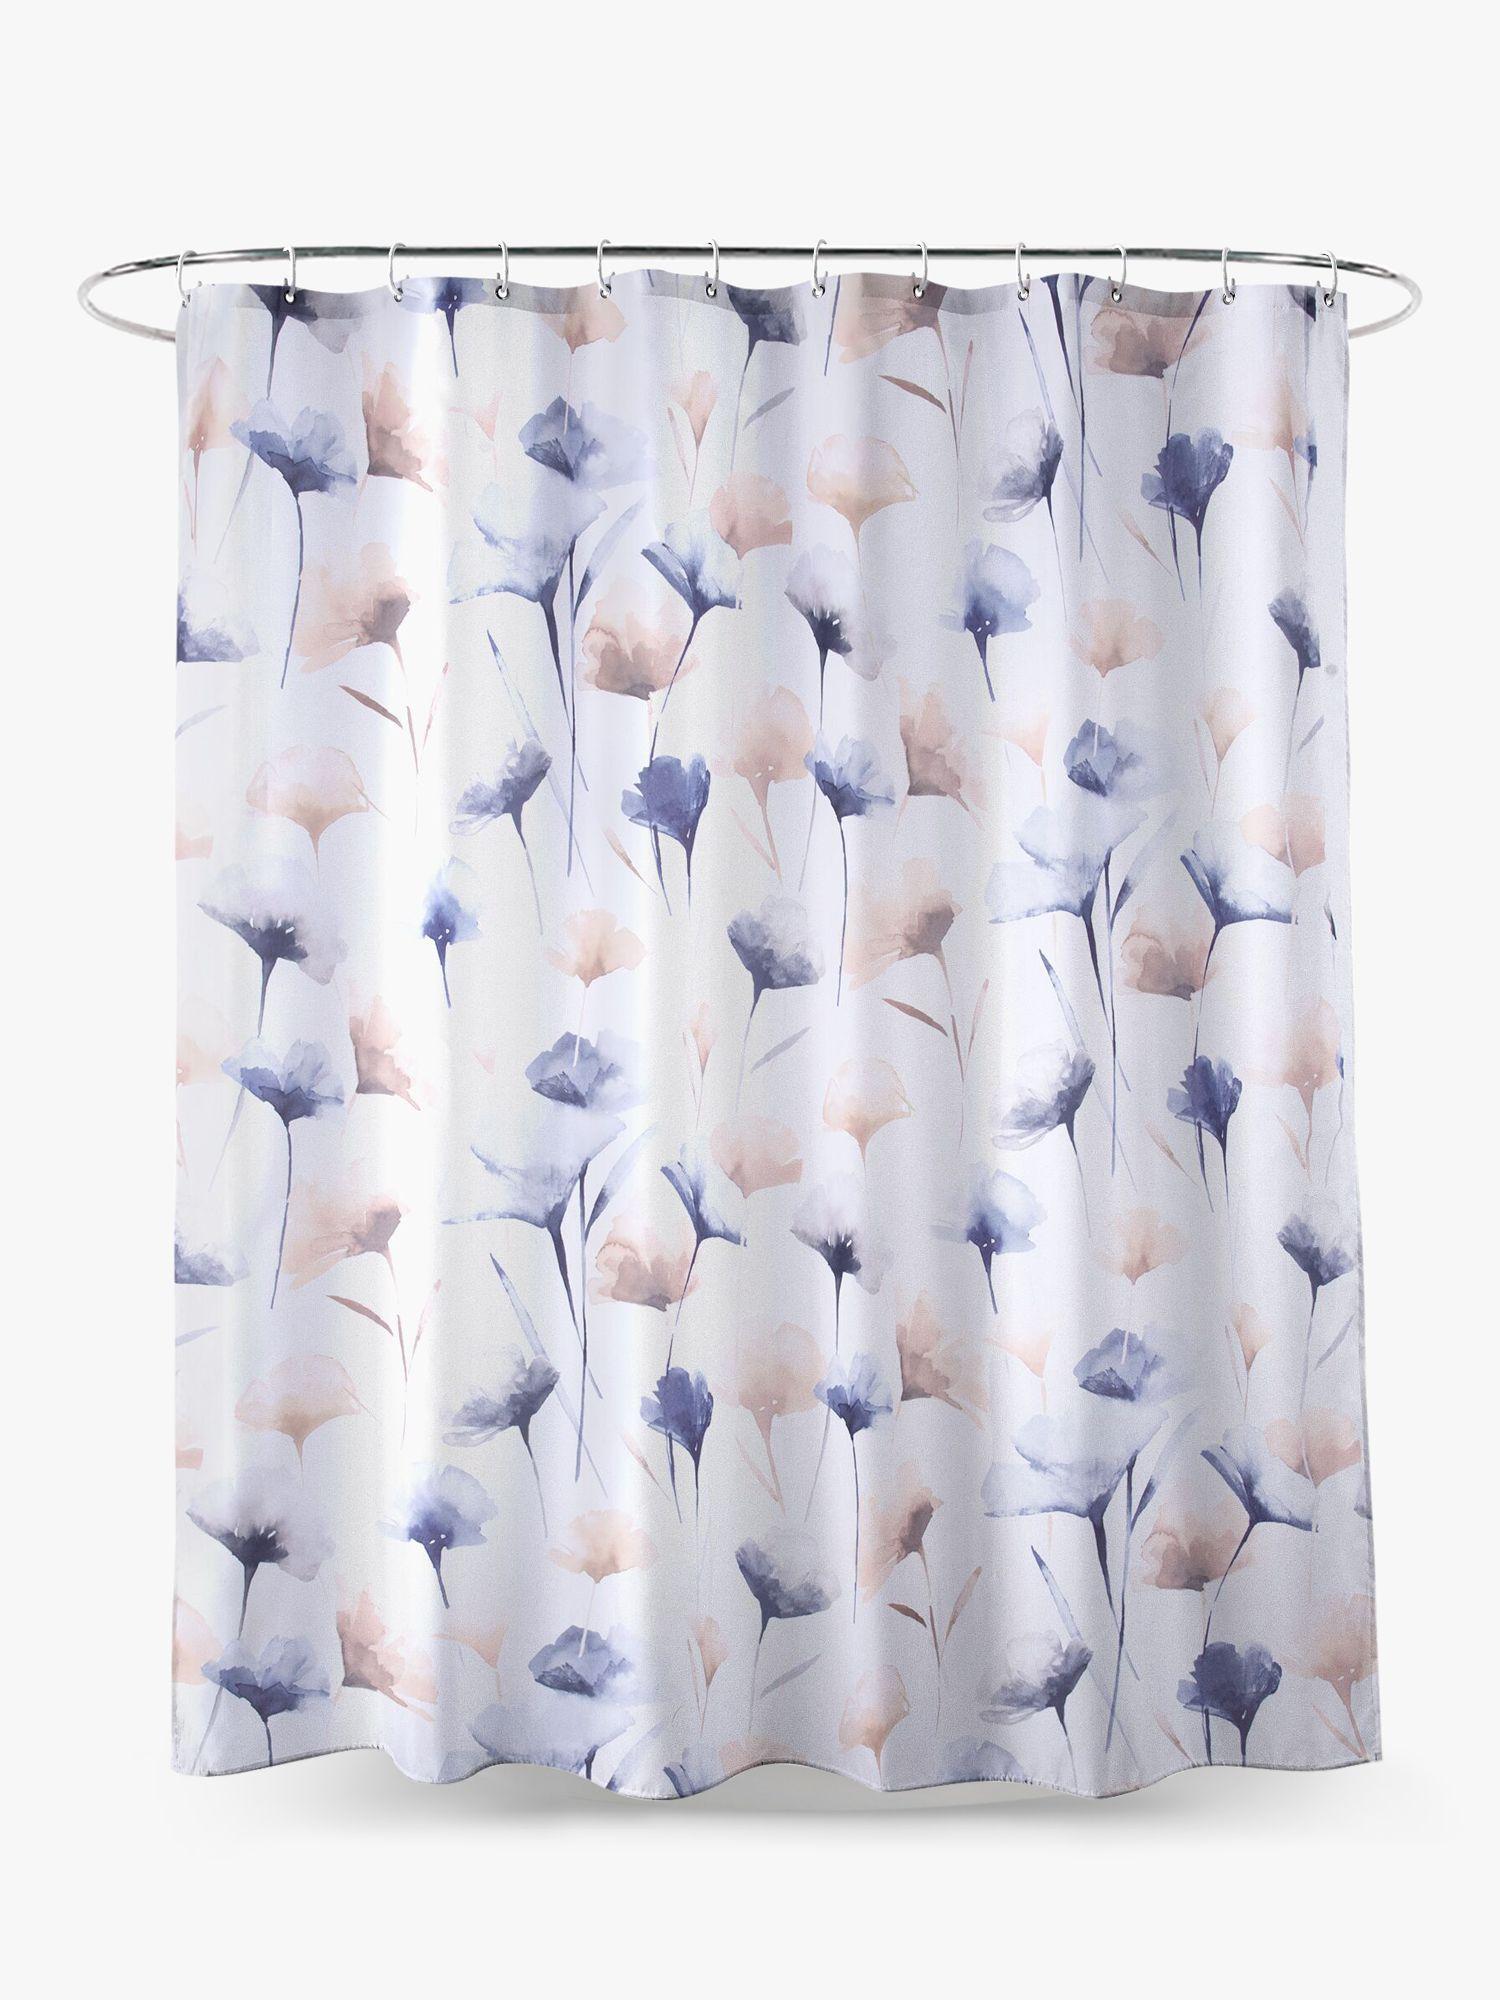 John Lewis & Partners Ginkgo Floral Shower Curtain